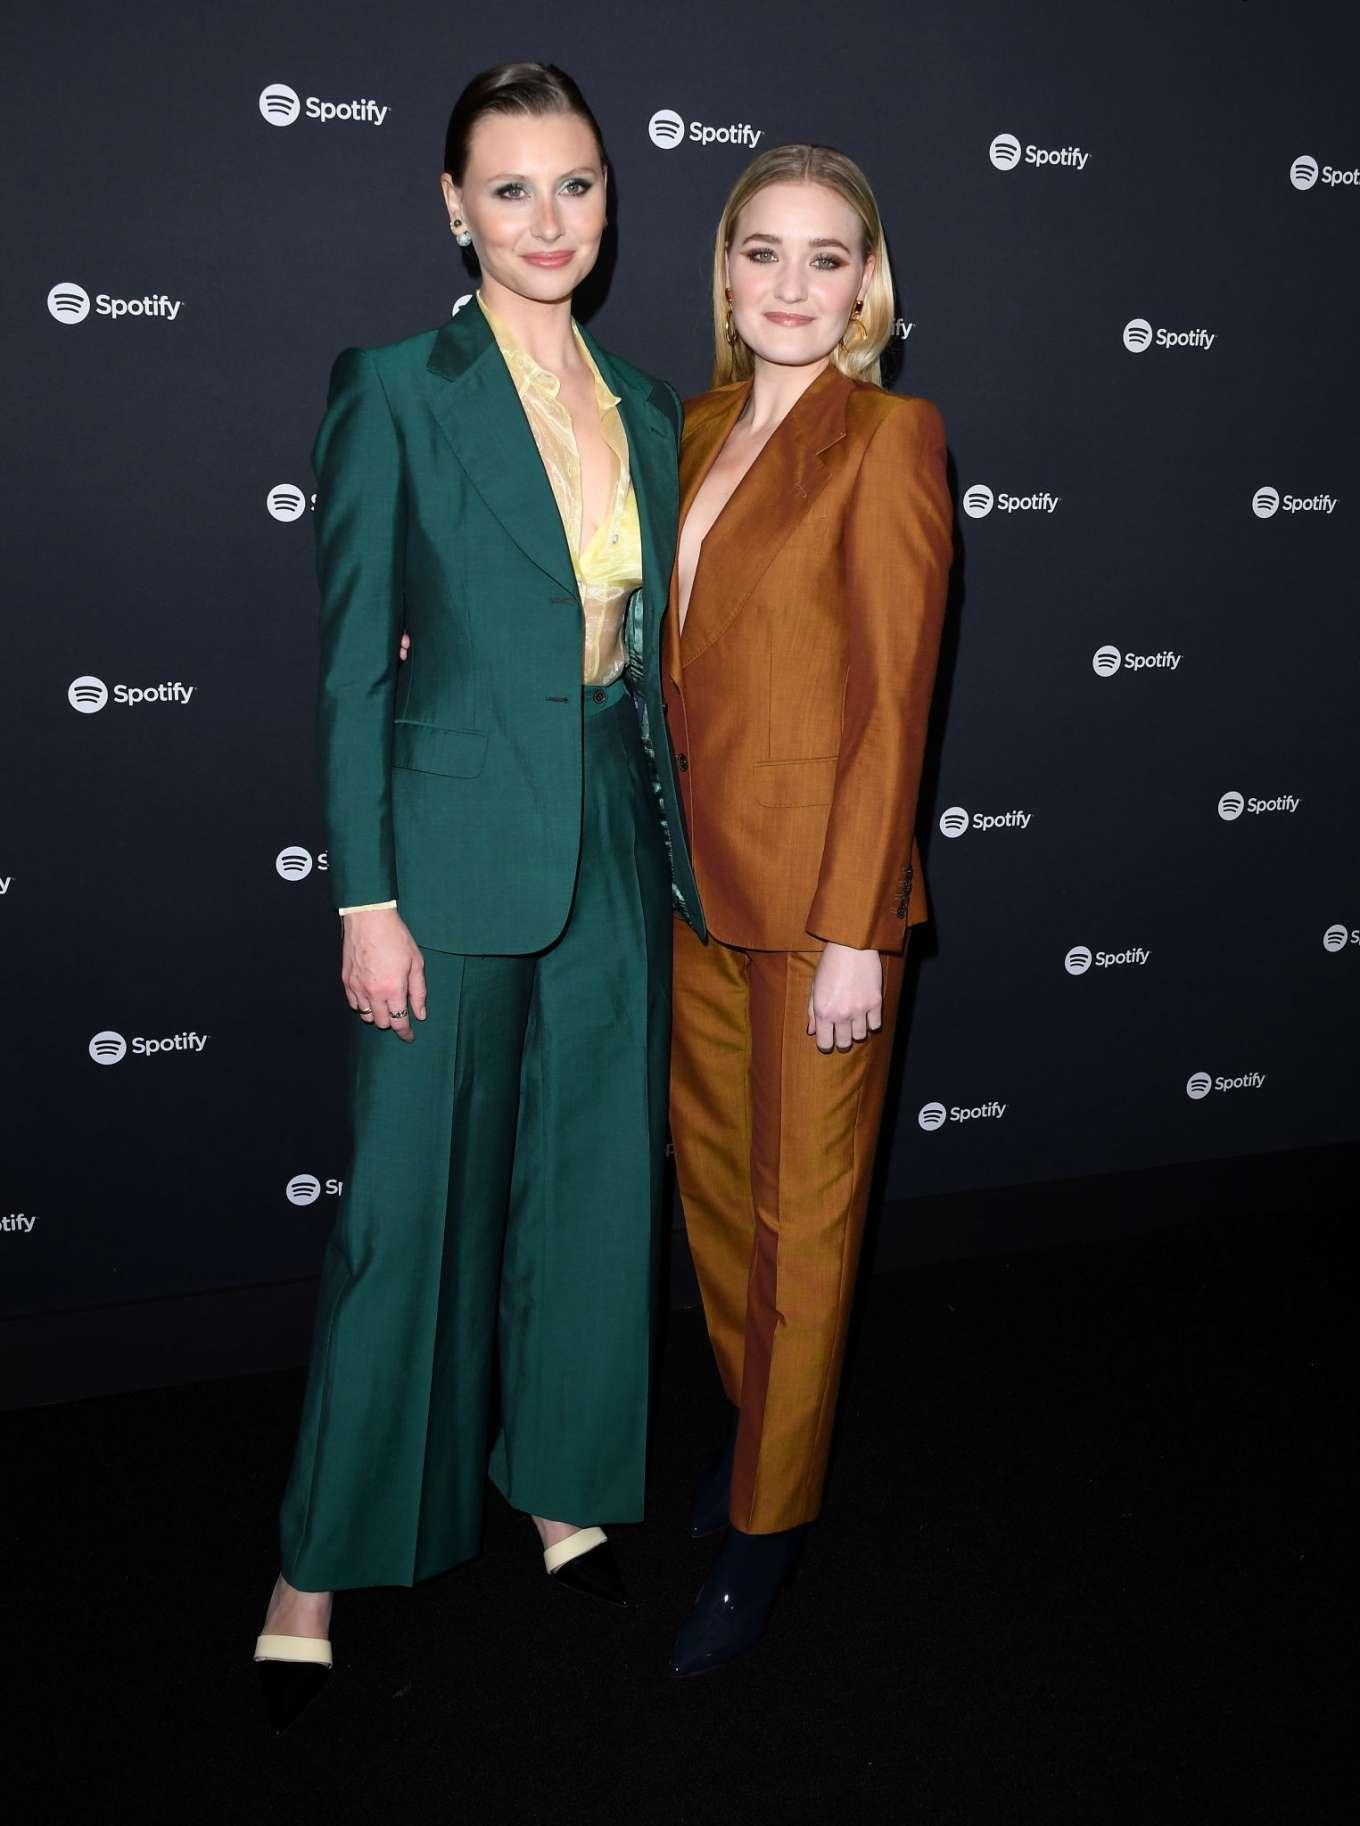 AJ Michalka 2020 : AJ Michalka and Aly Michalka – Spotify Best New Artist Party-15